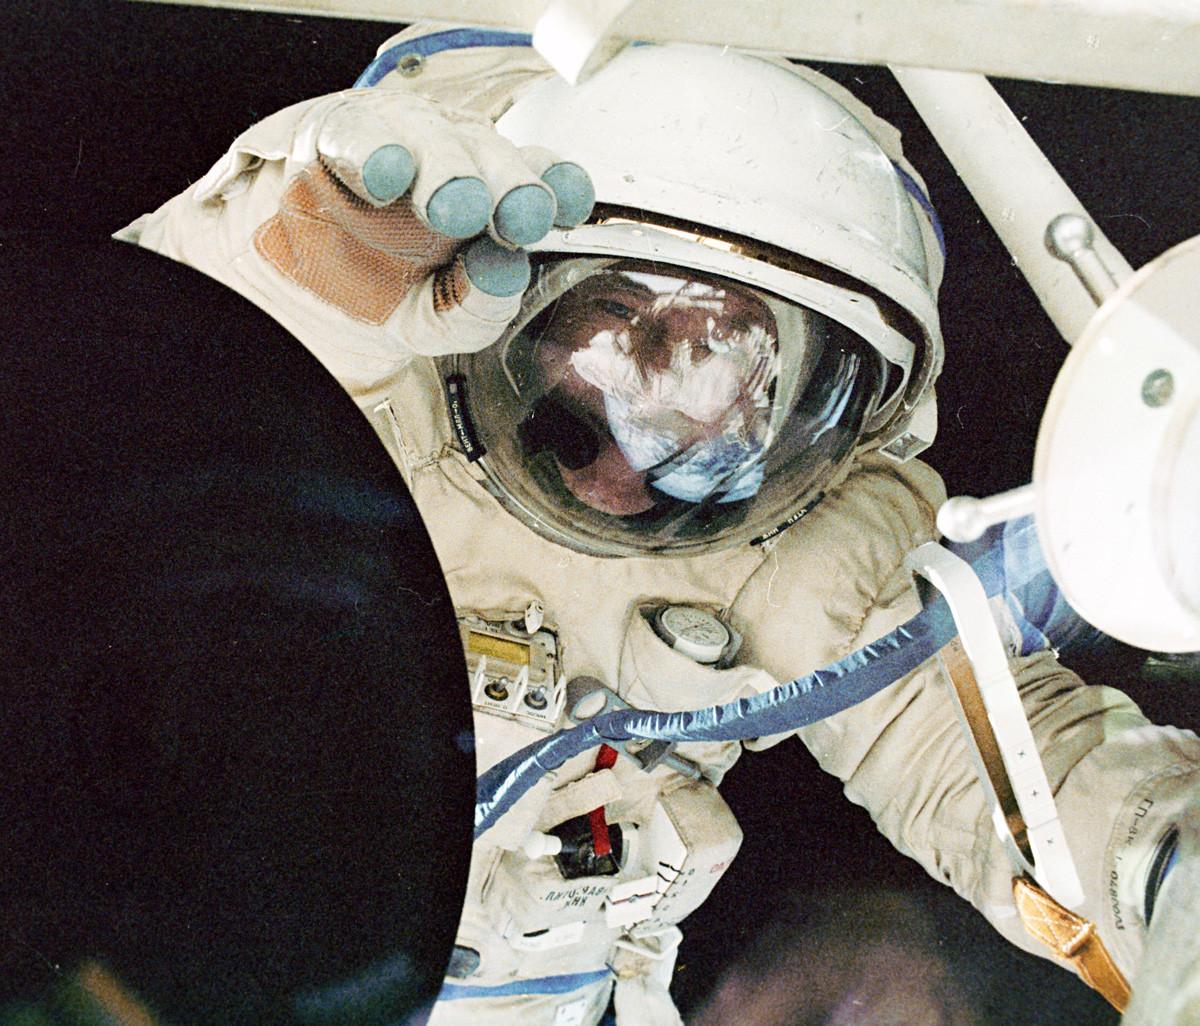 Francuski kozmonaut Jean Chrétien u otvorenom svemiru.